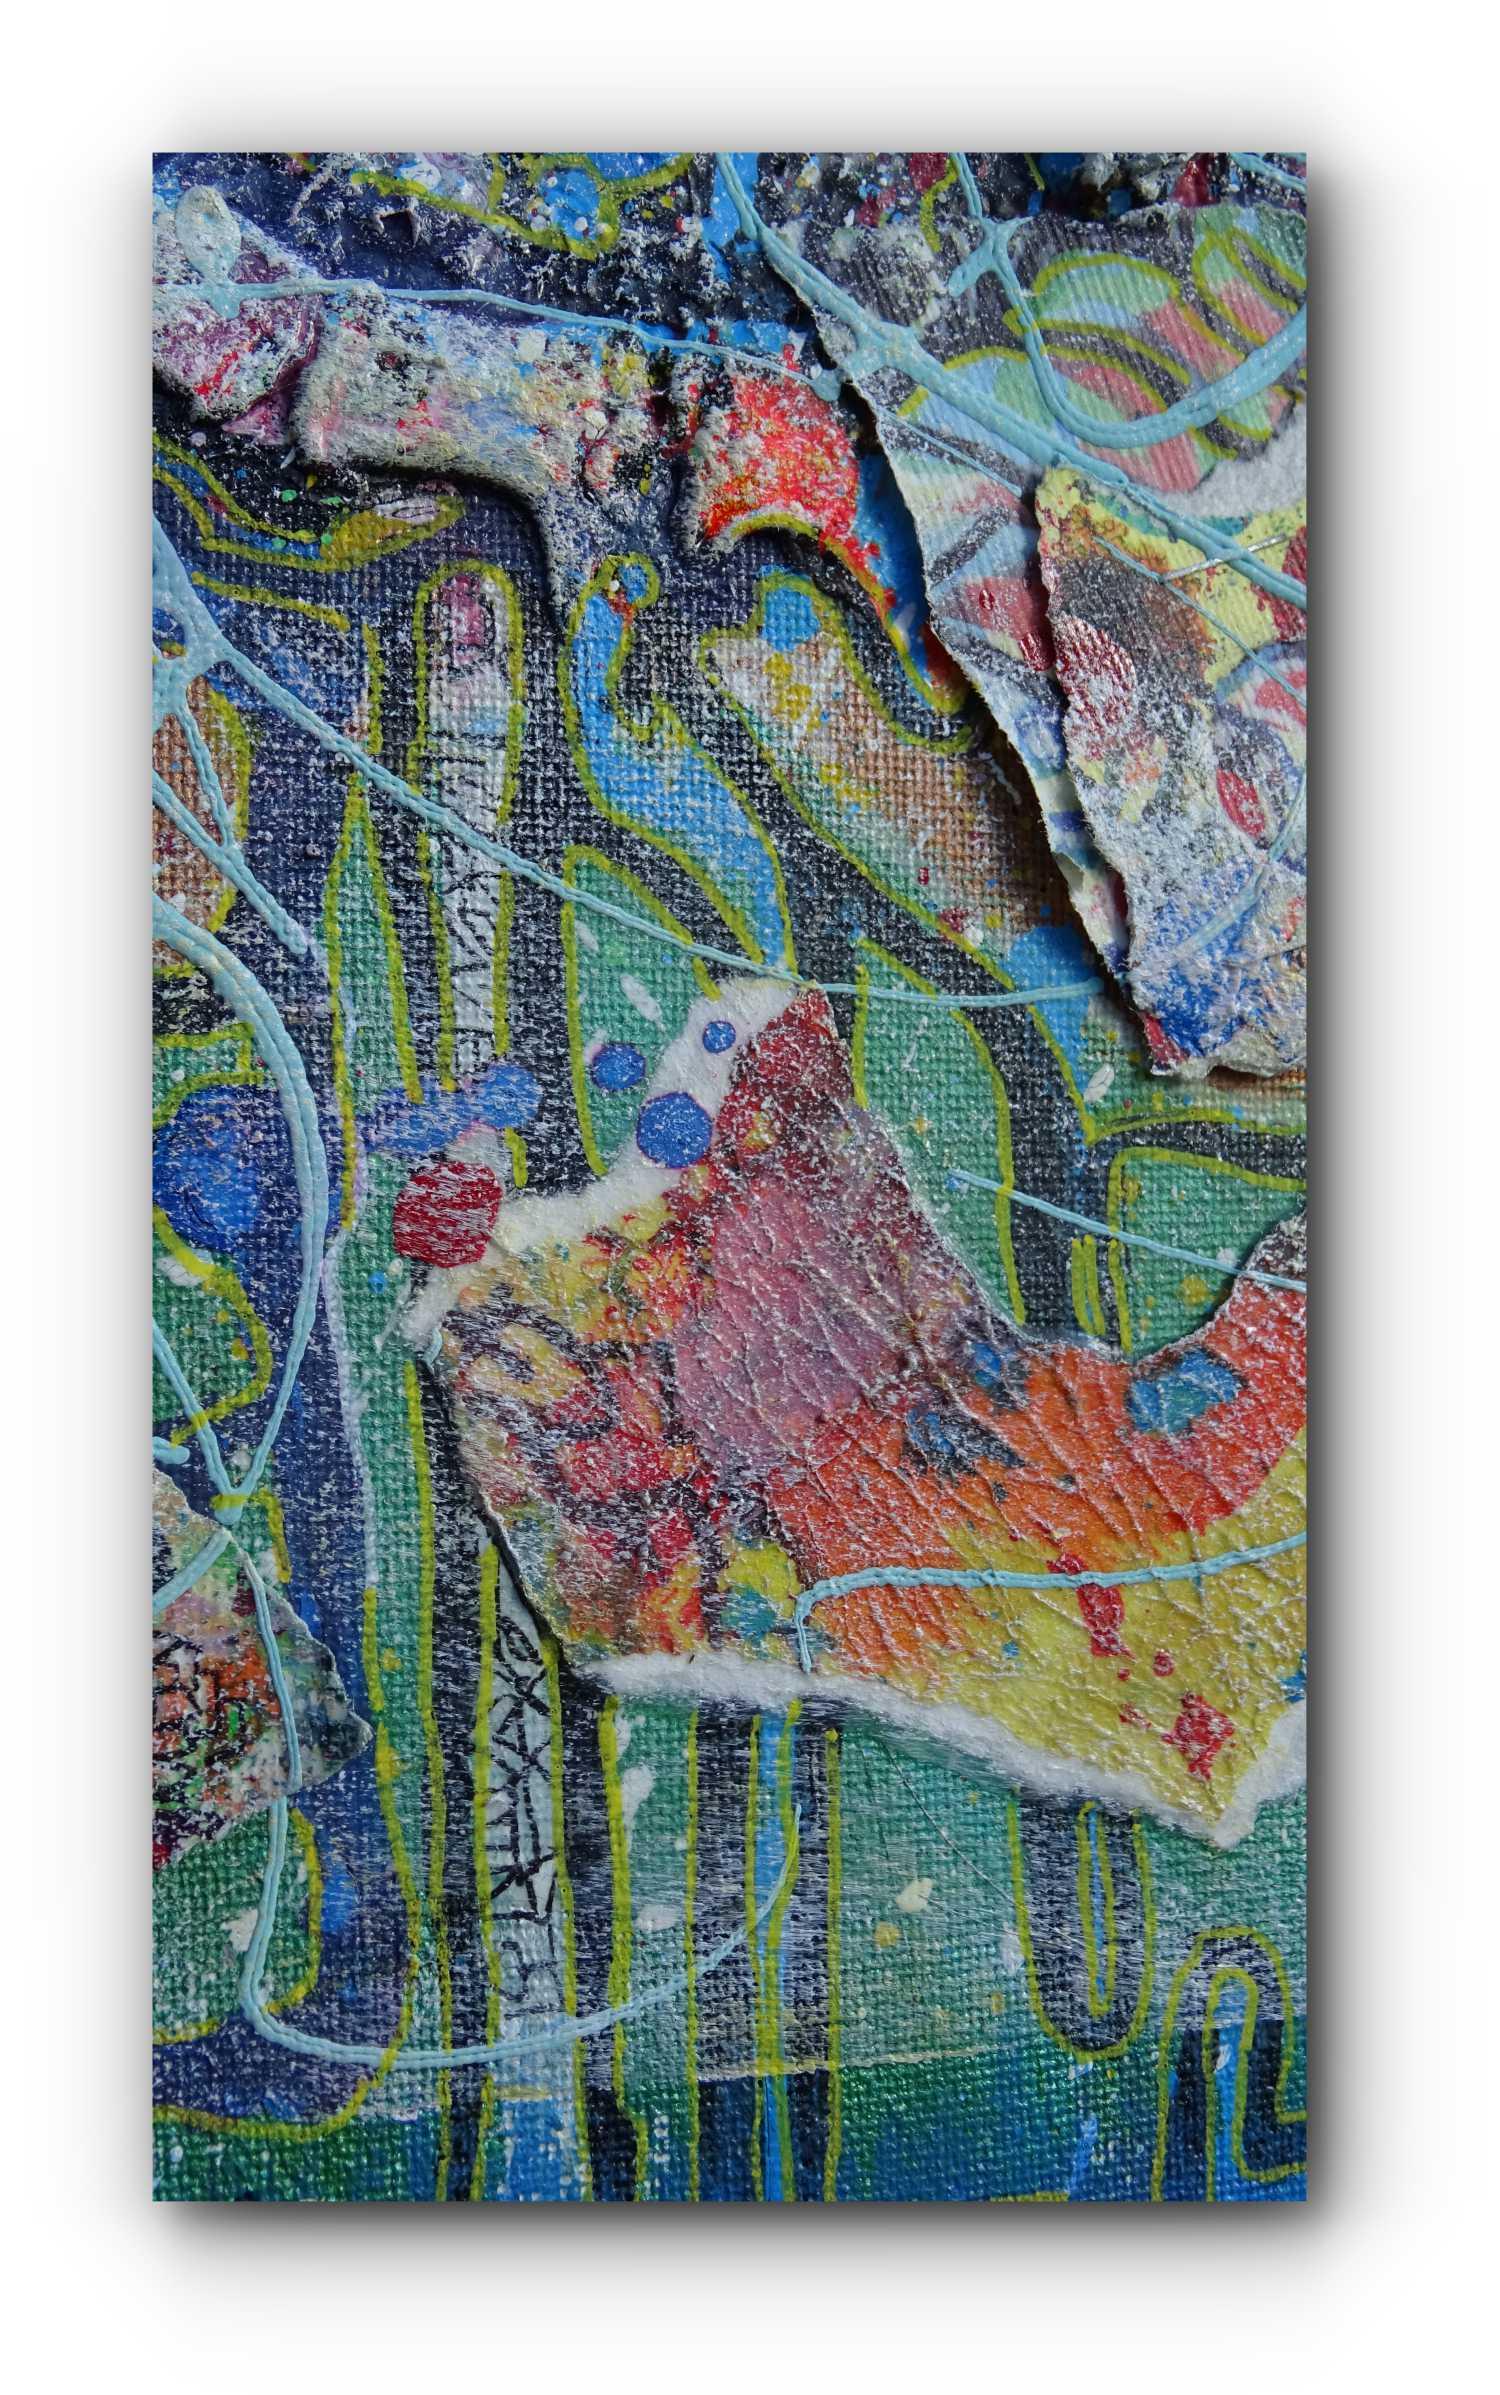 painting-detail-7-pillars-cosmos-artists-ingress-vortices.jpg